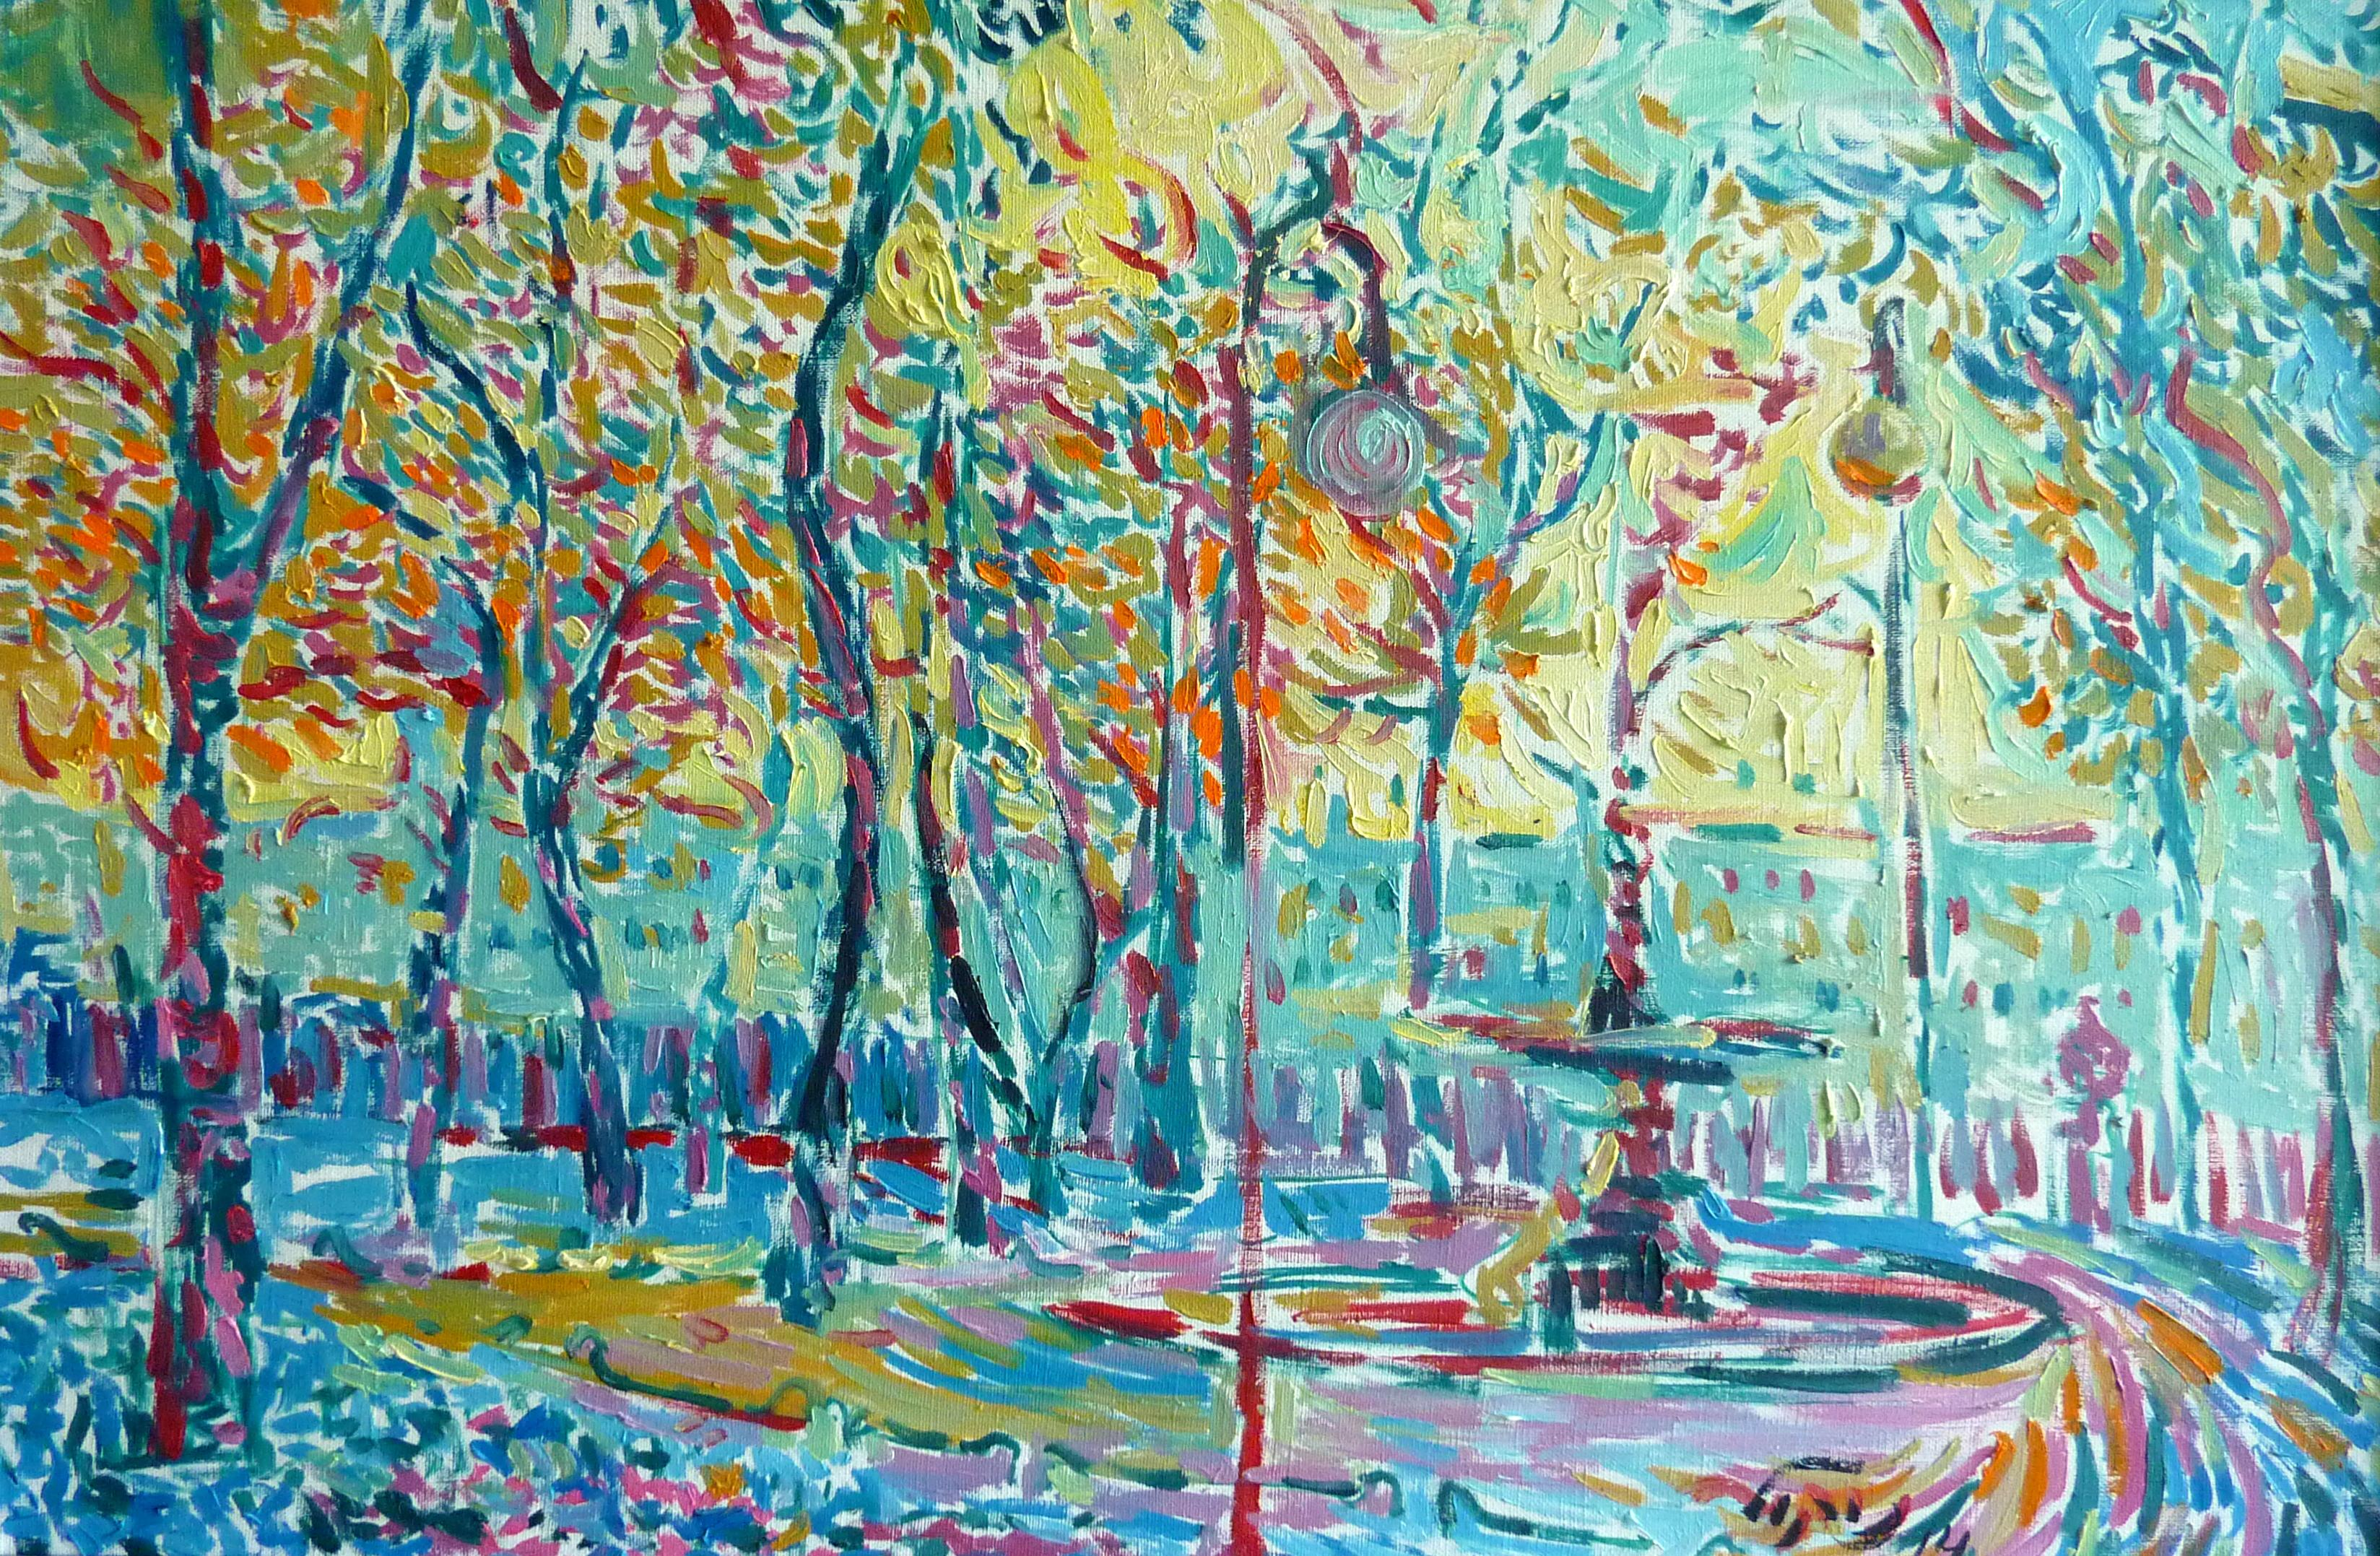 Summer Garden - 21st Century Contemporary Pointillism Landscape Oil Painting